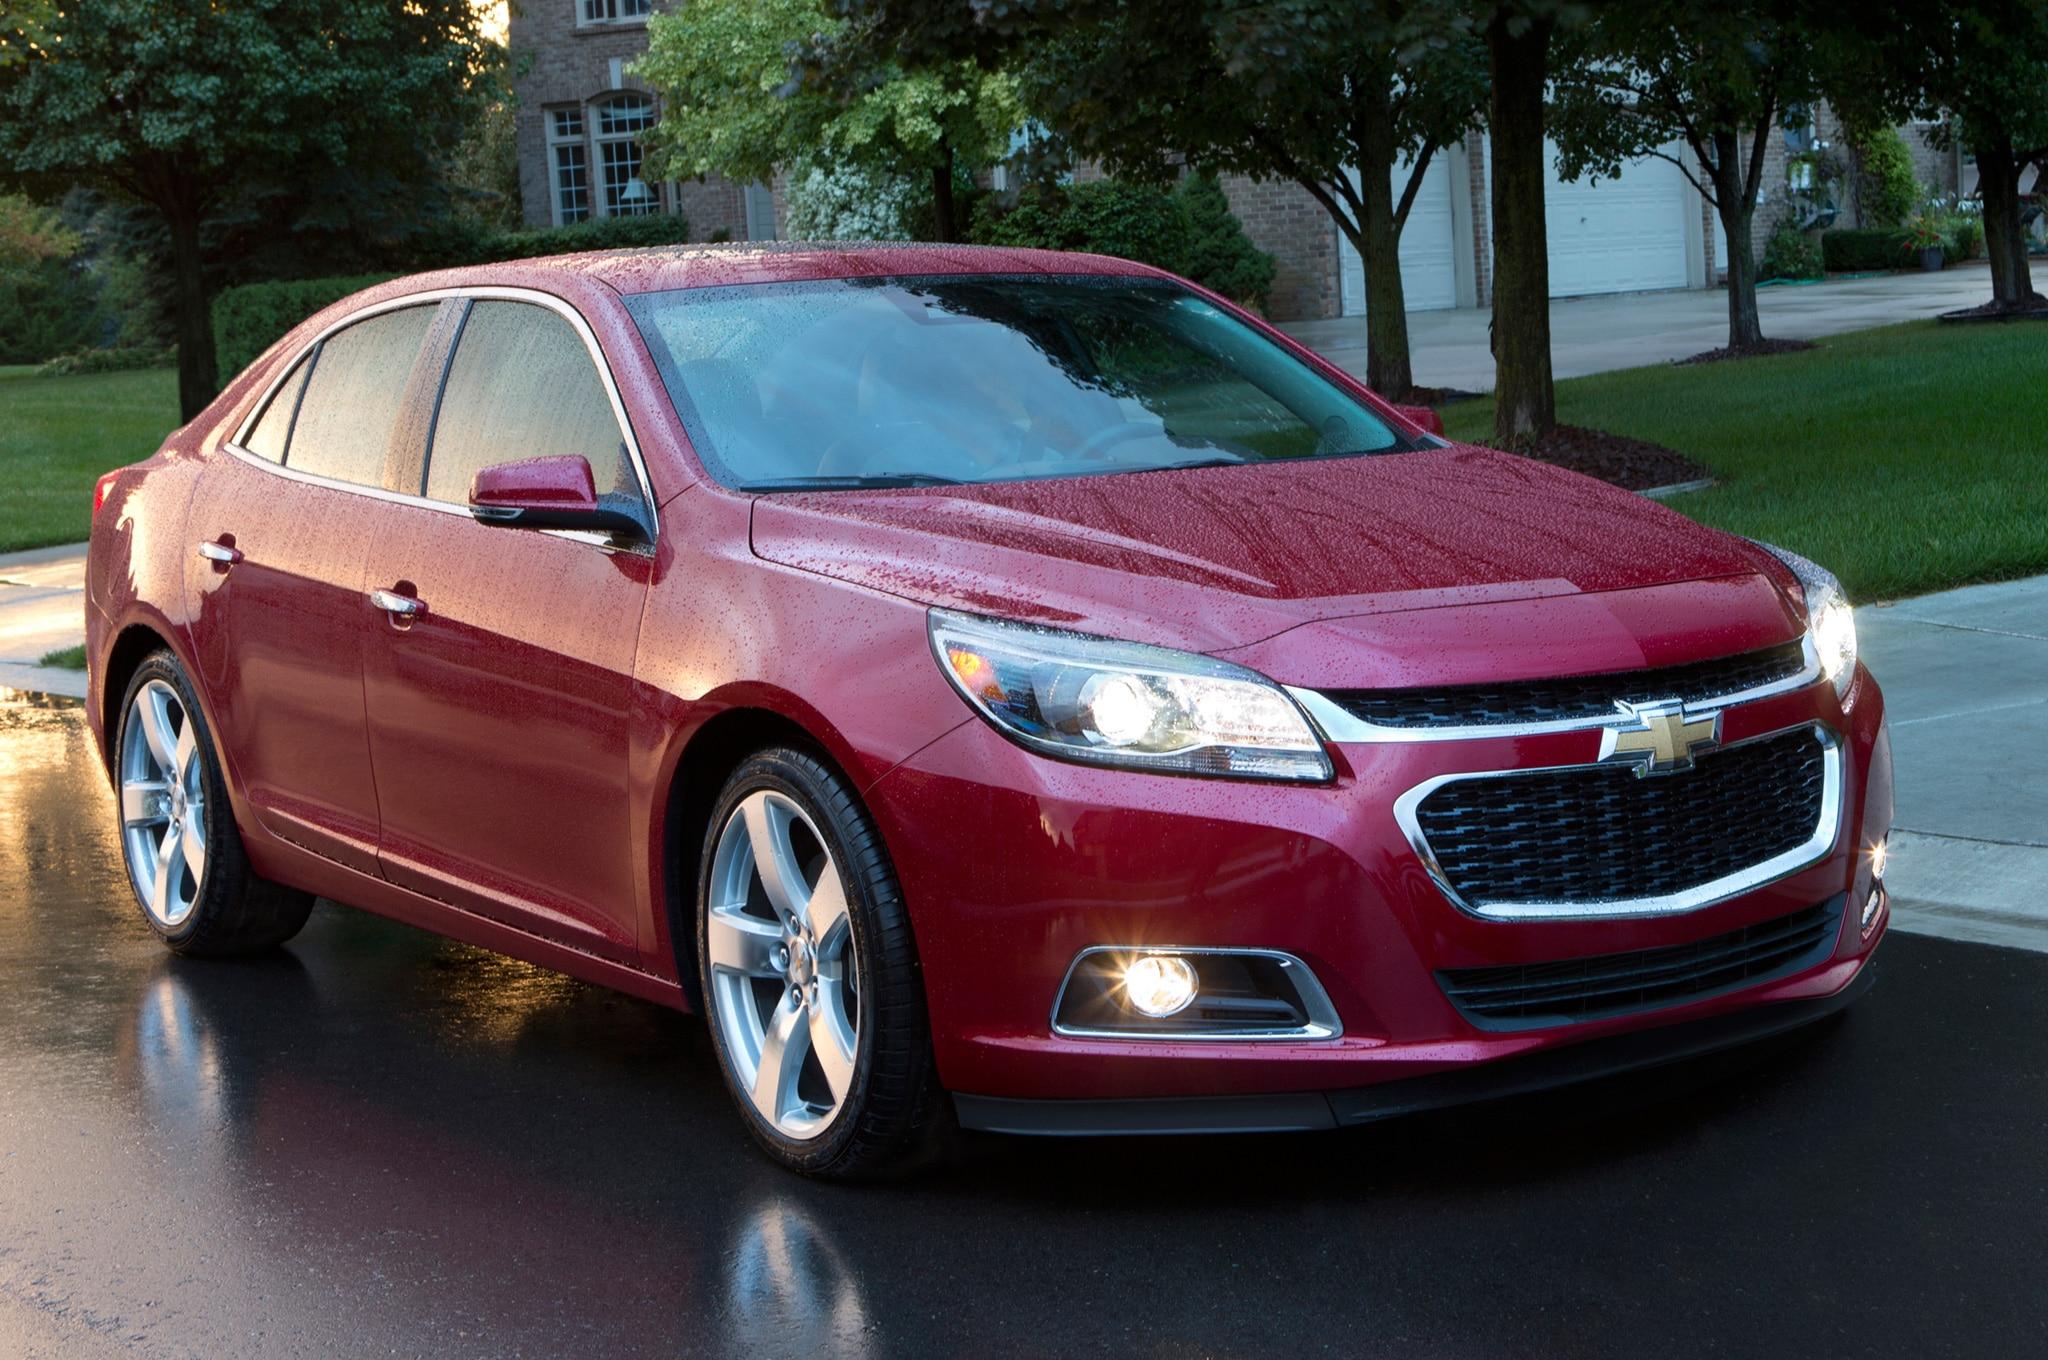 2014 Chevrolet Malibu Drops E Assist Mild Hybrid Model